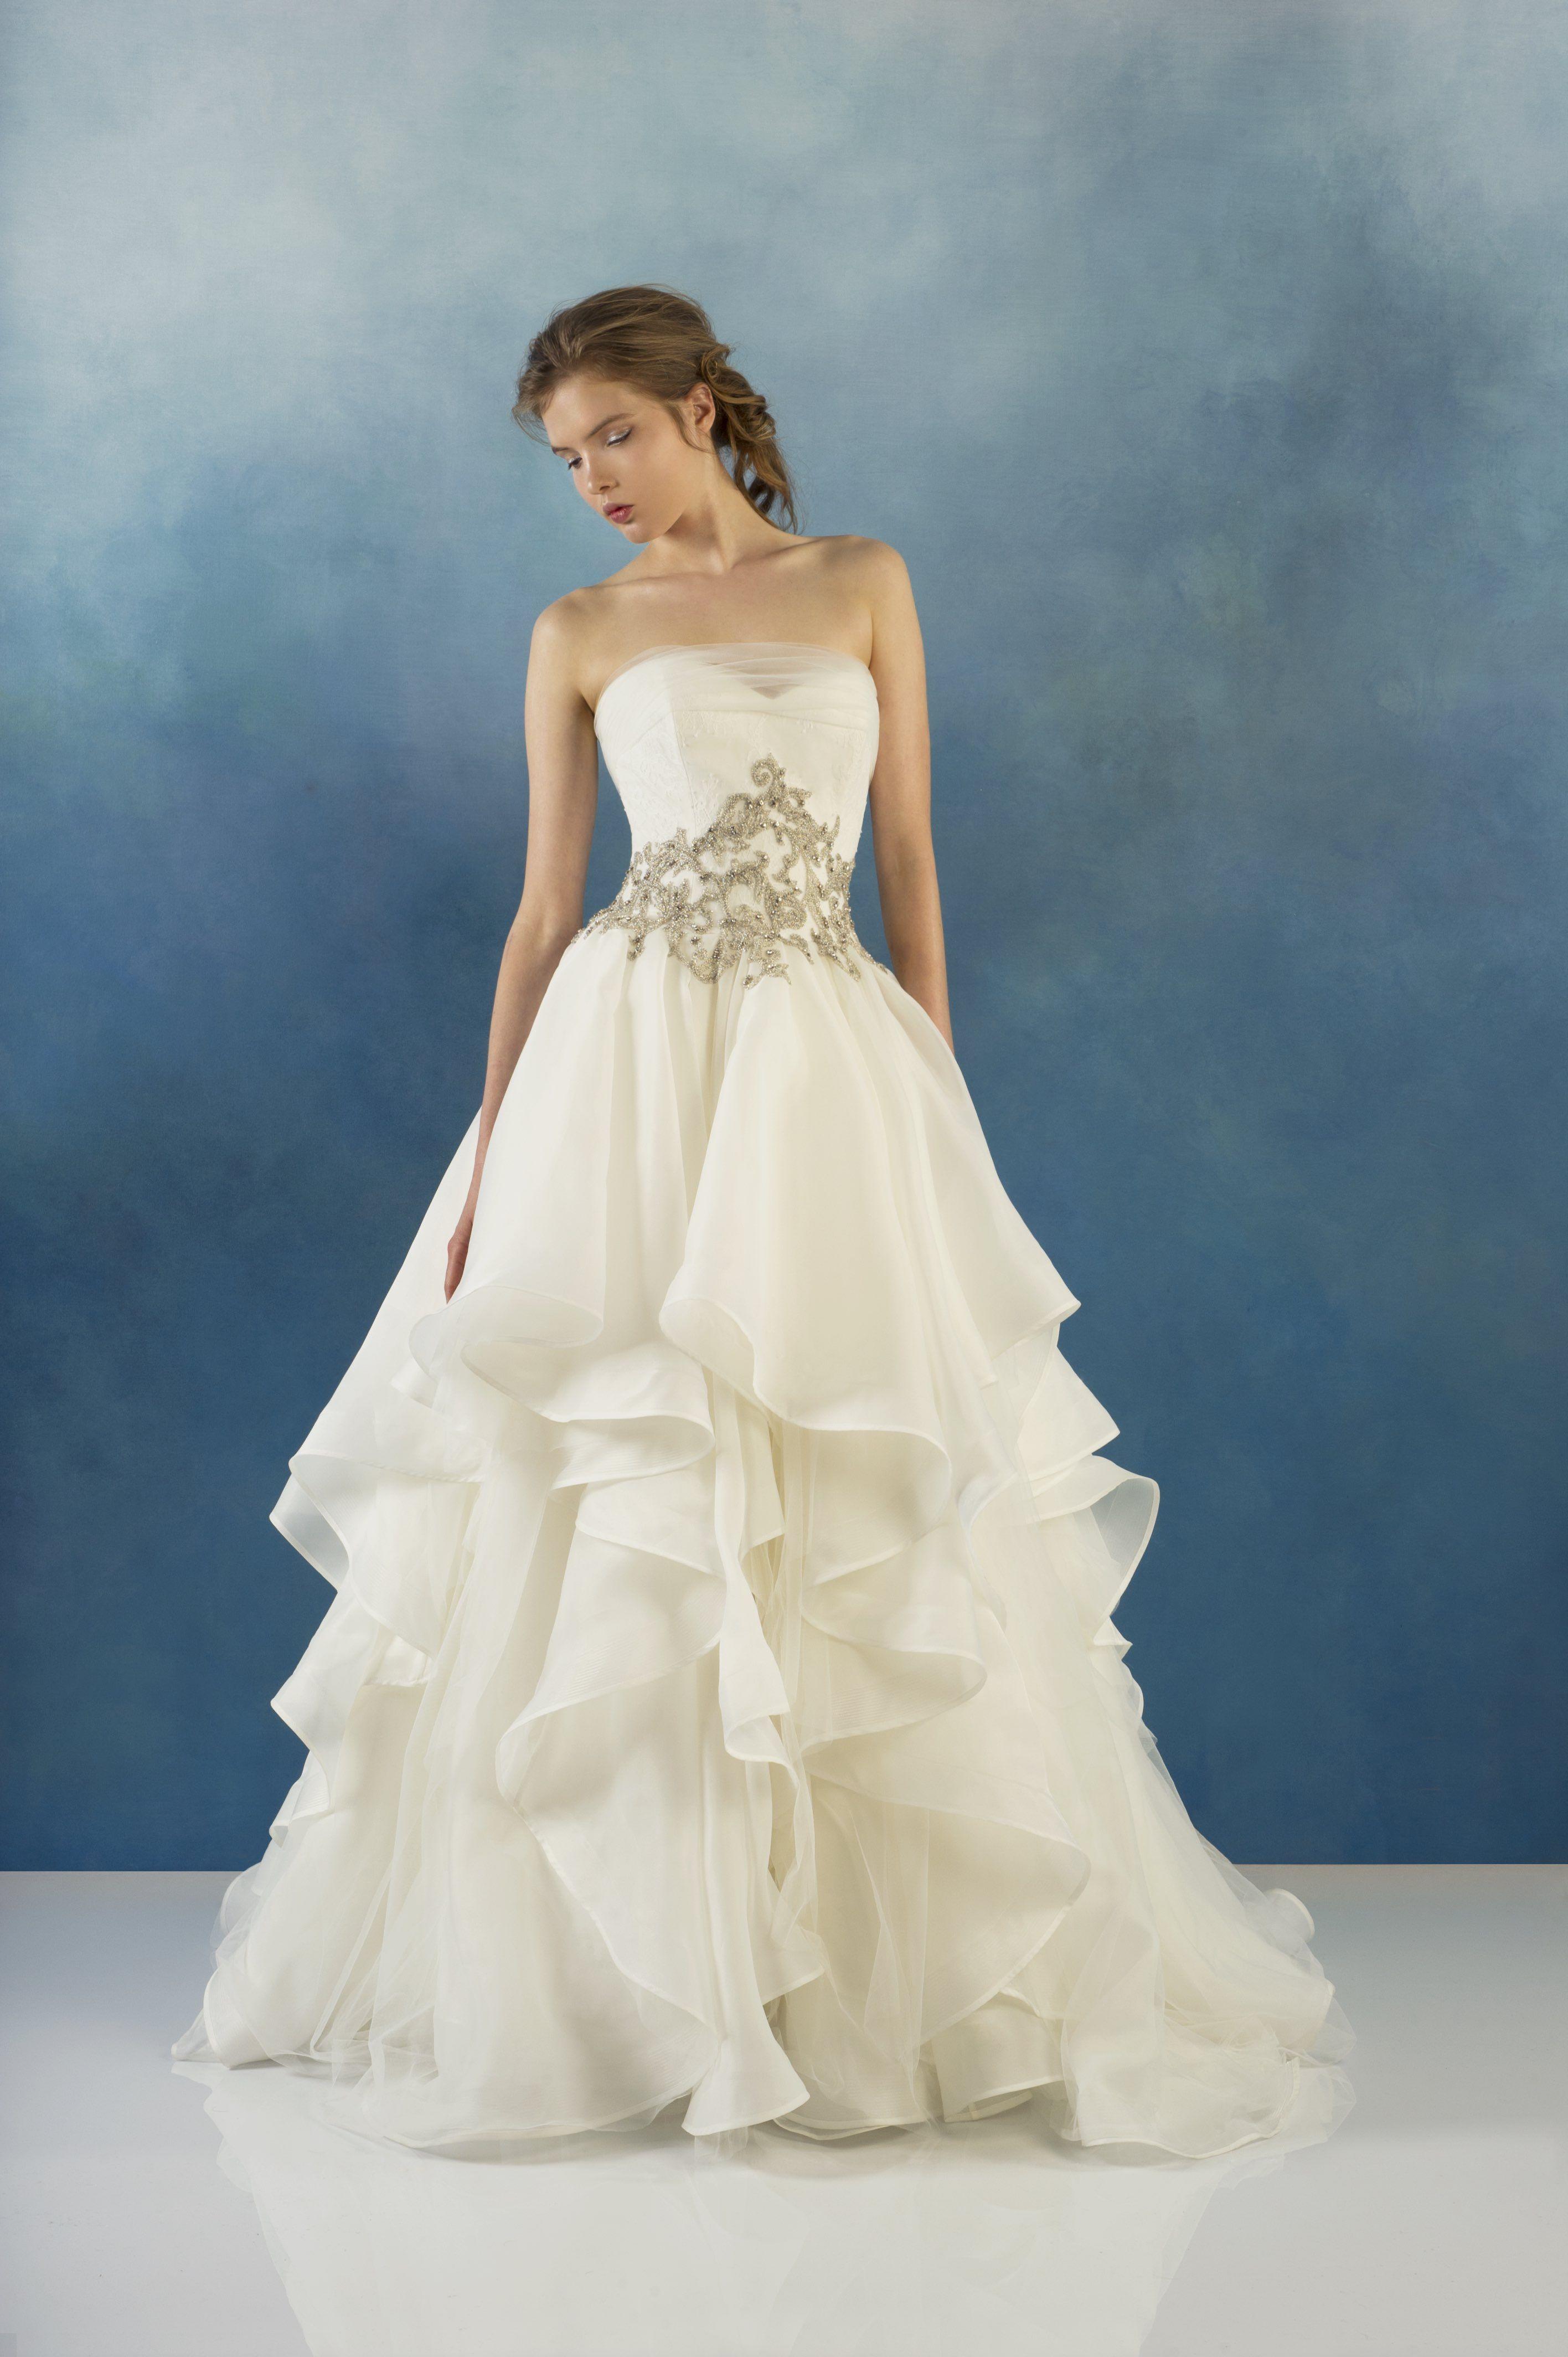 Genevieve alyne spring wedding dresses pinterest spring